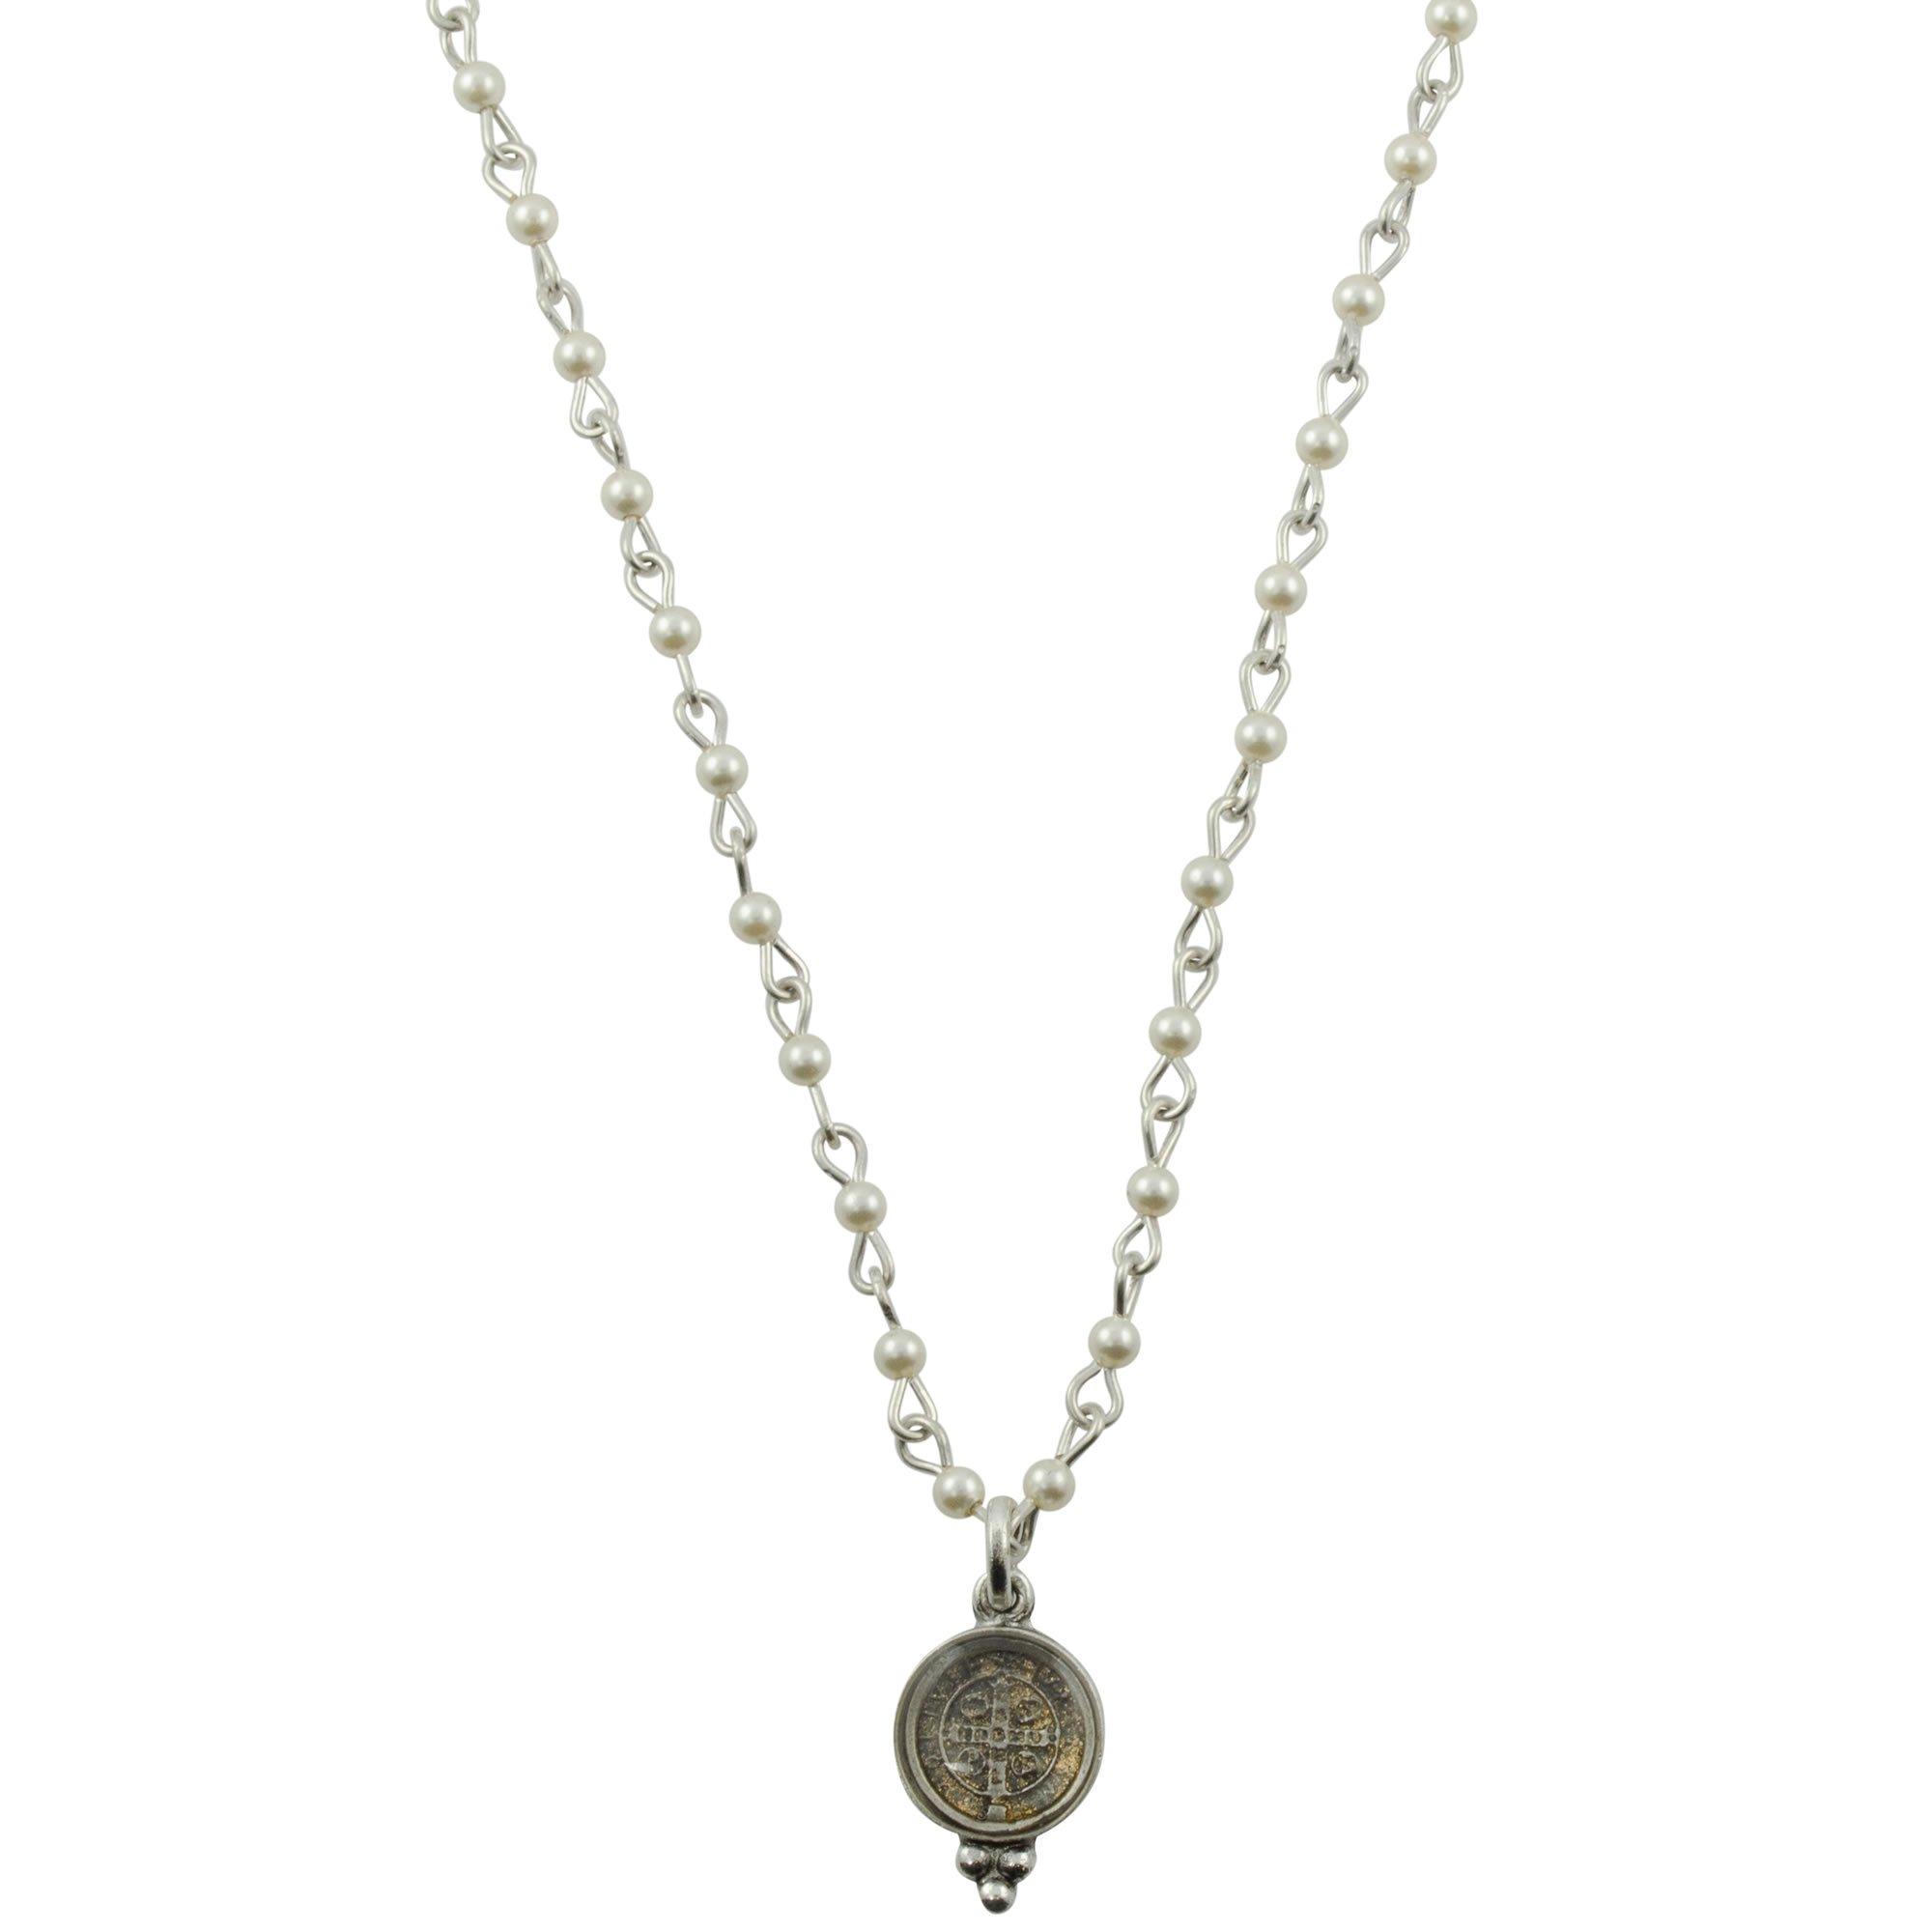 Piccolo Lucia Choker - Silver + Pearl - VSA - Virgins Saints Angels Jewelry